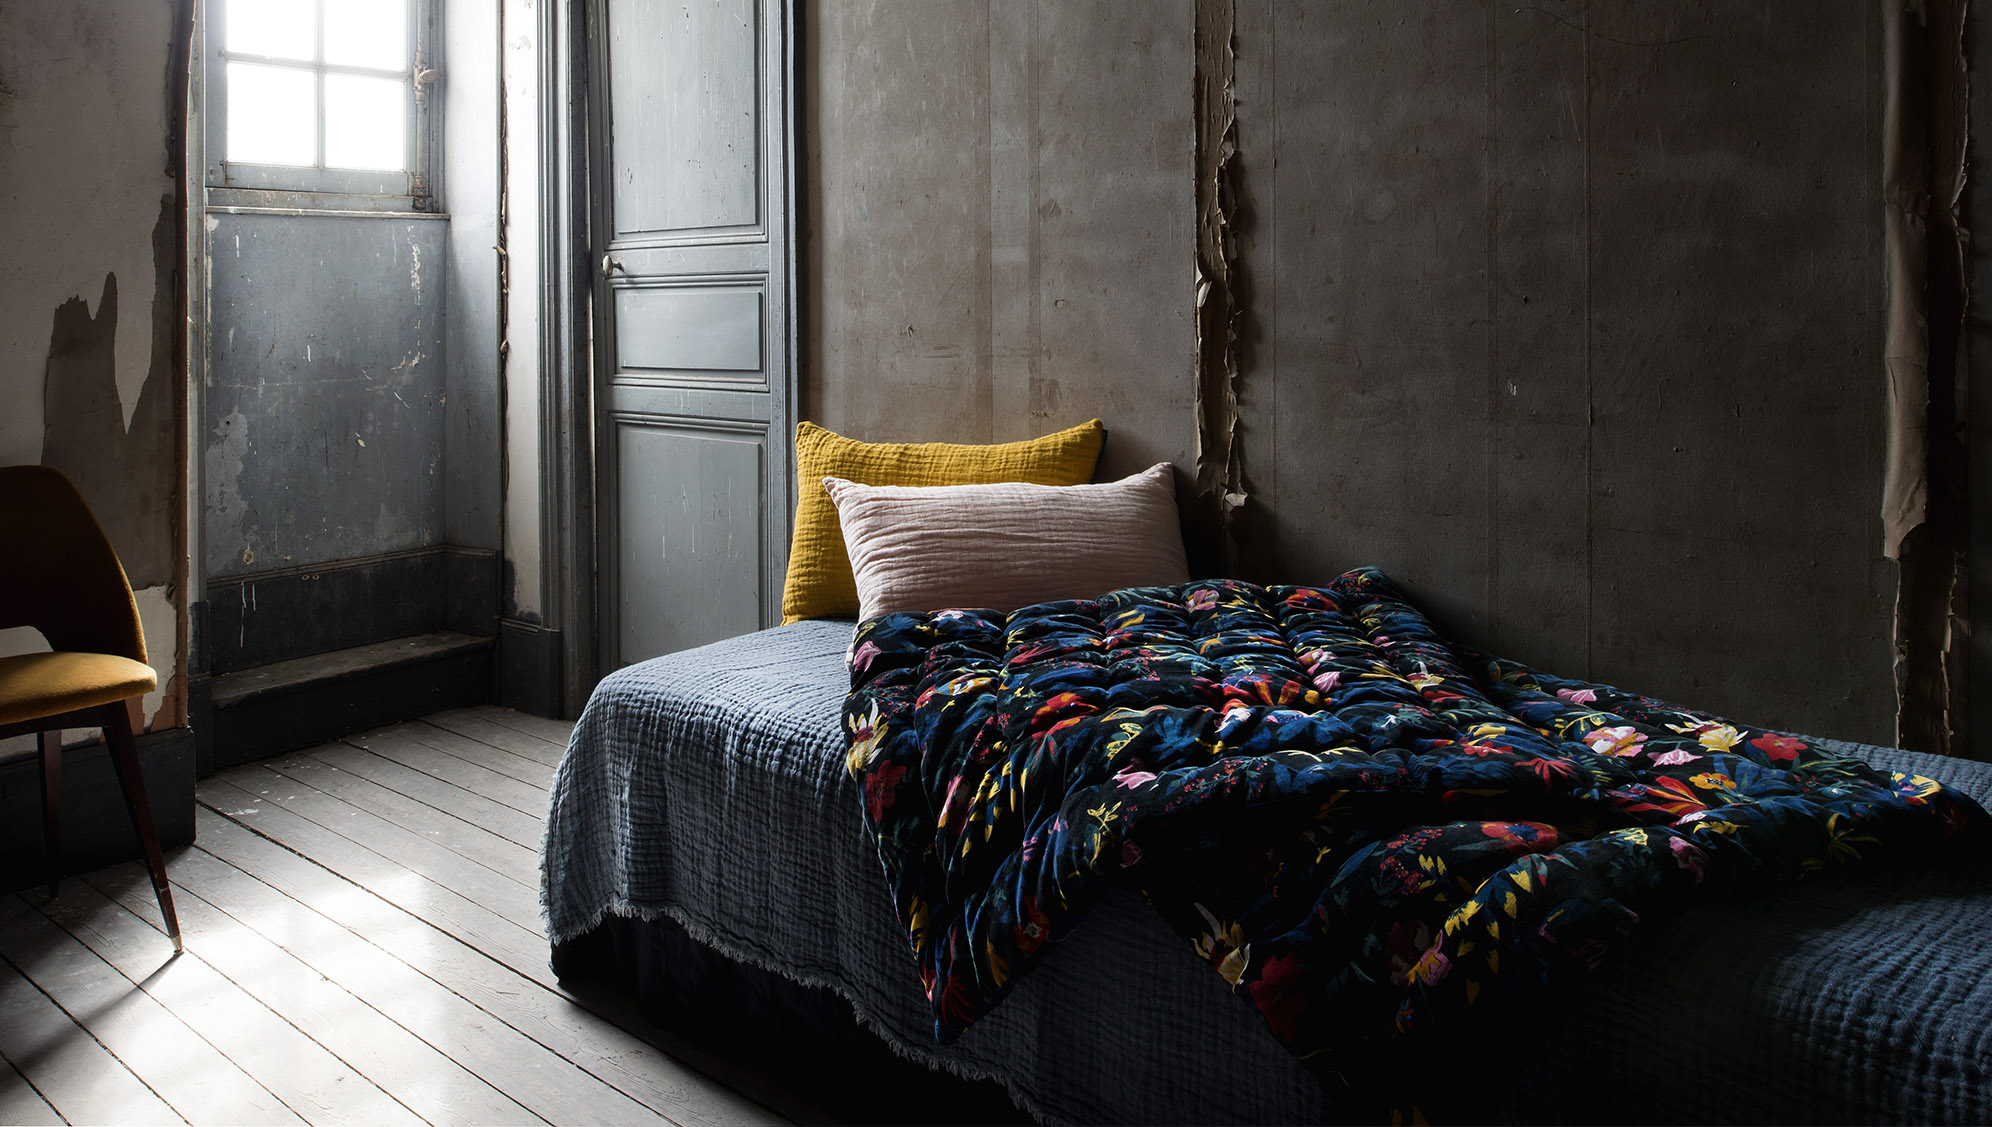 le monde sauvage de b atrice laval adresse d co goodmoods. Black Bedroom Furniture Sets. Home Design Ideas